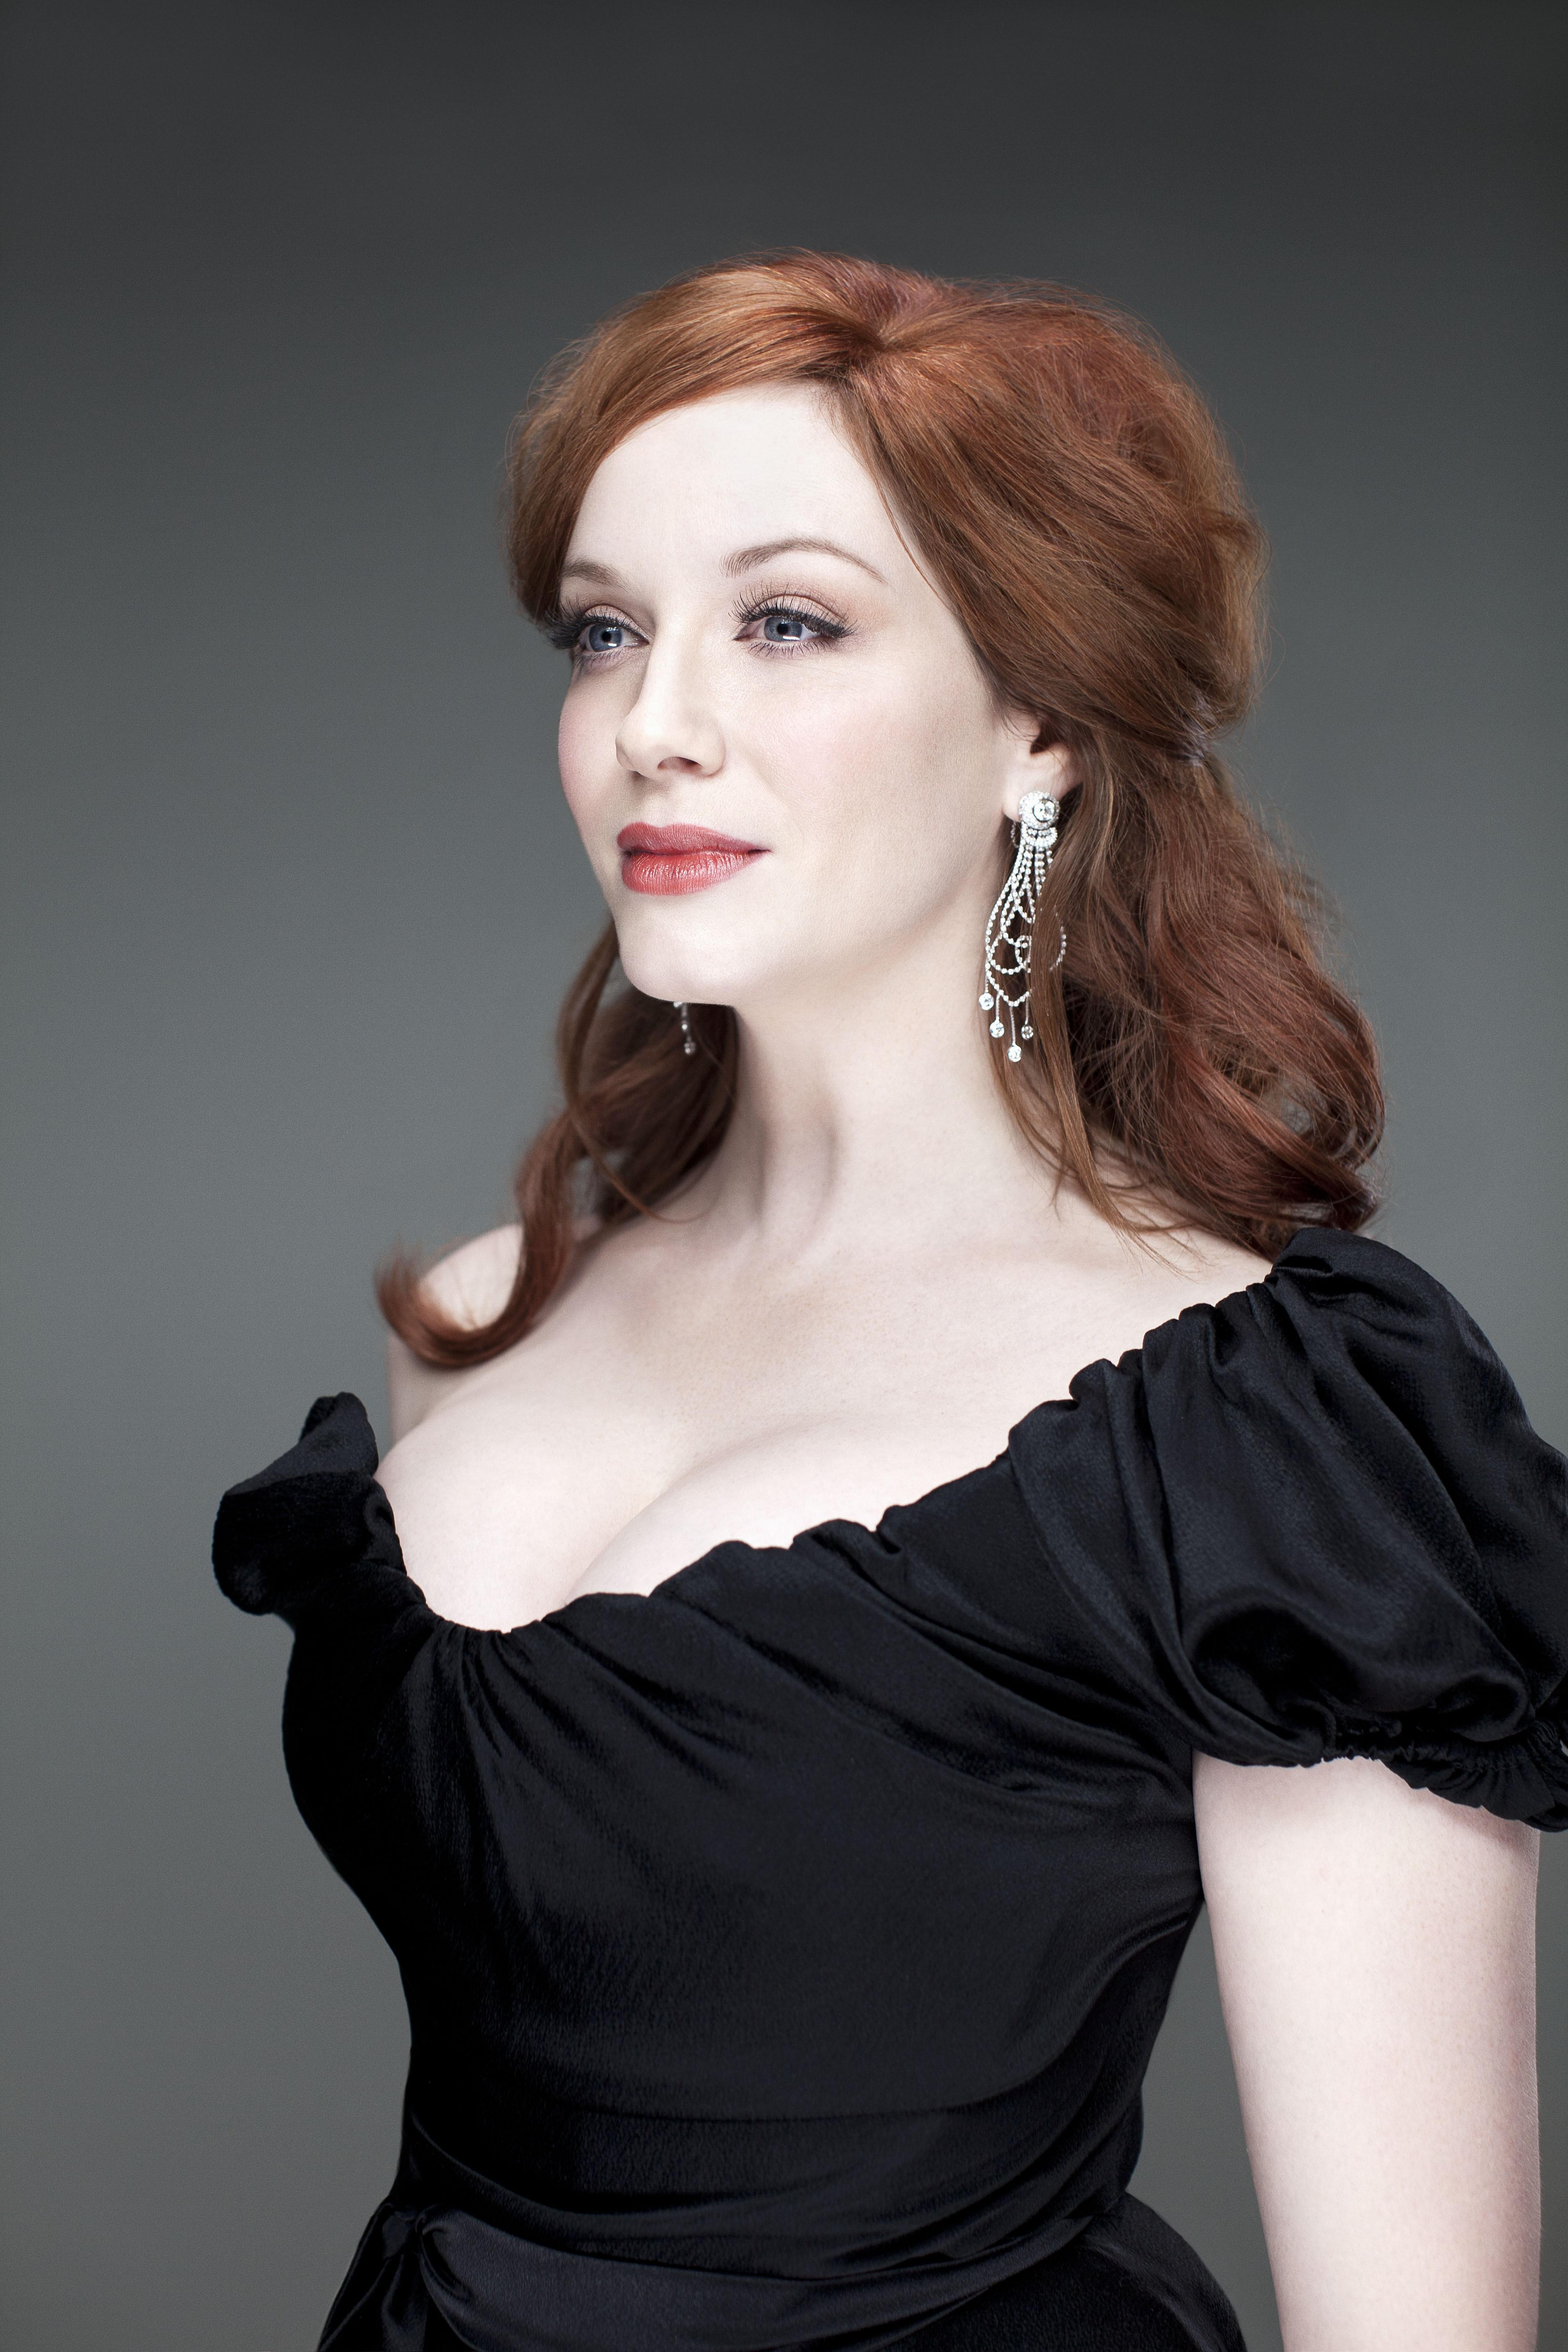 redhead-adult-actress-men-nude-locker-room